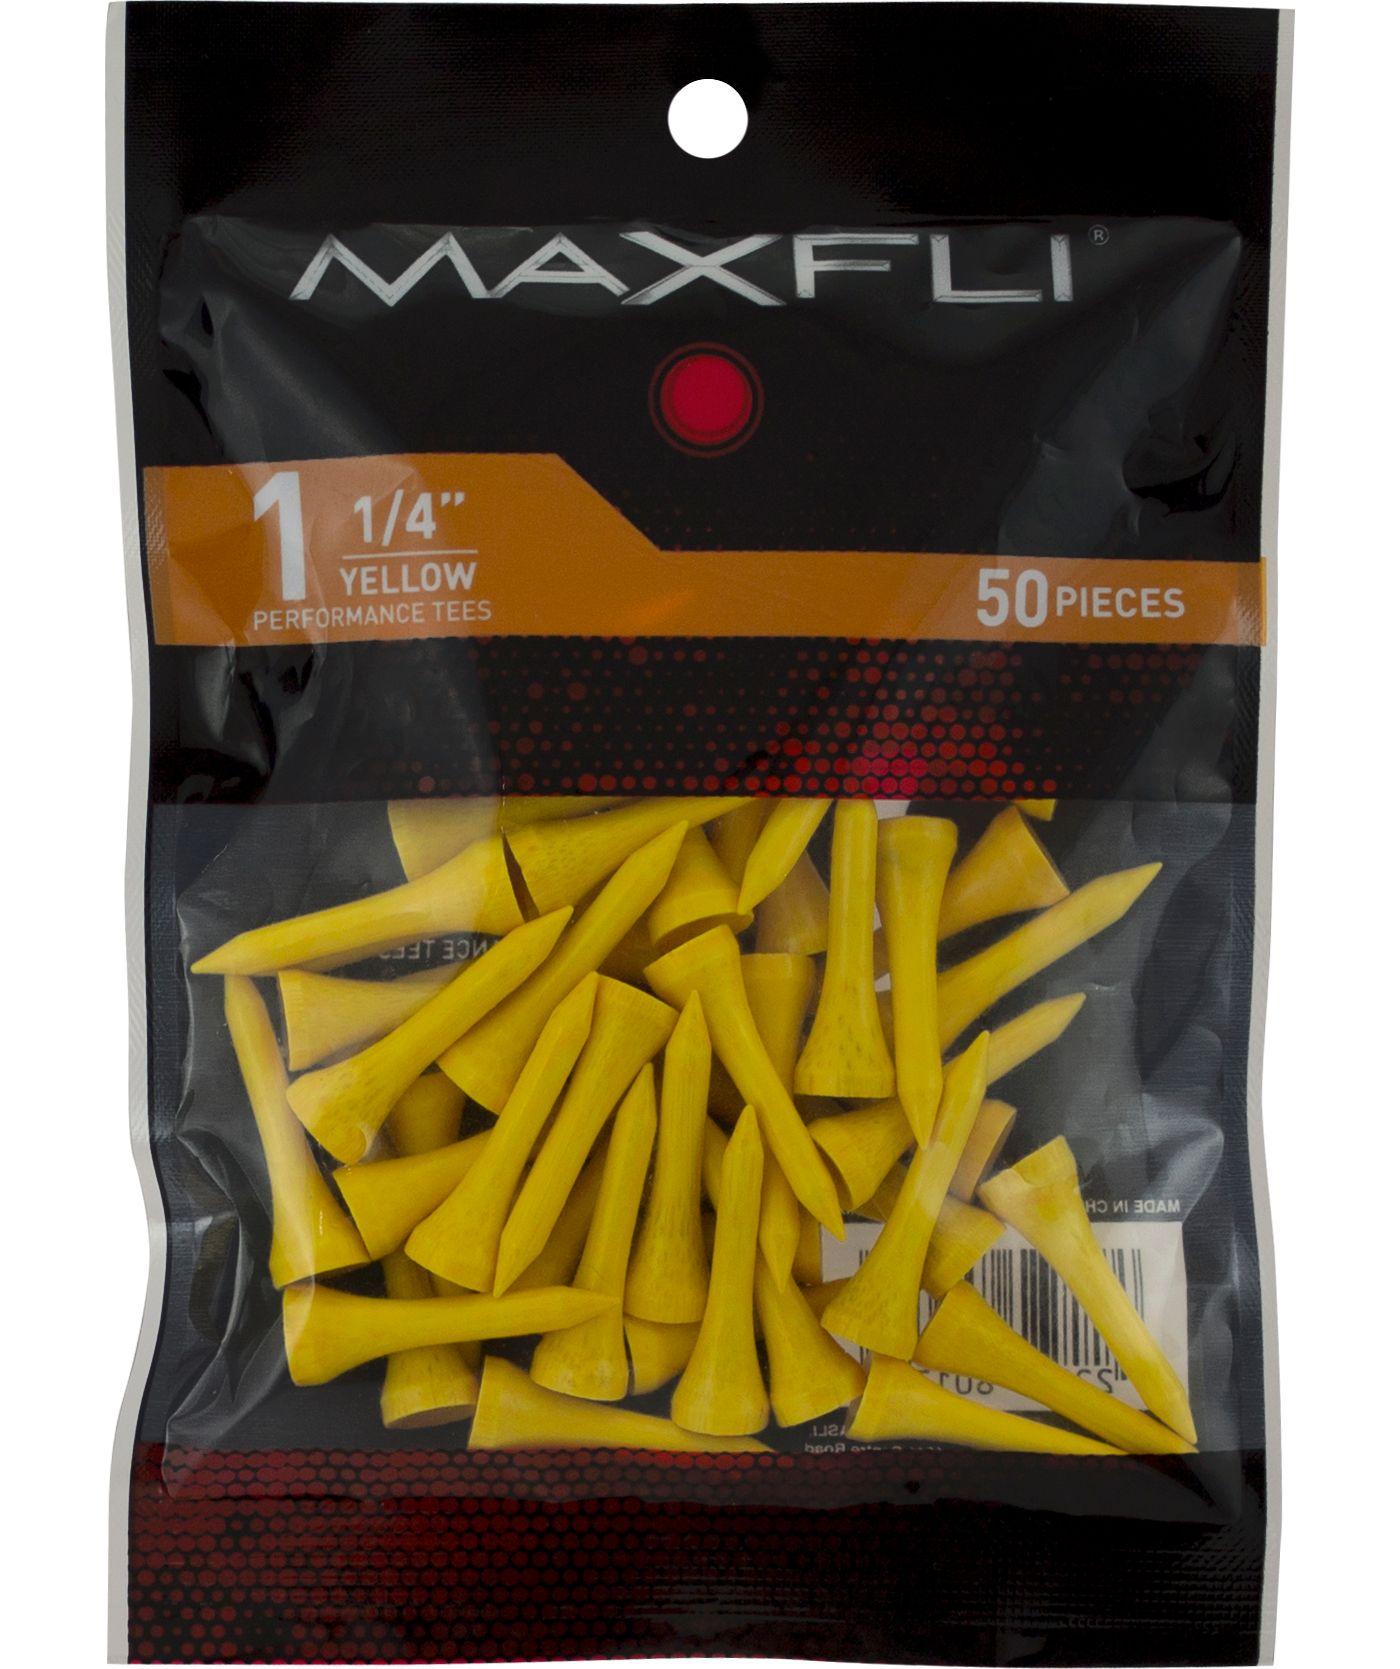 Maxfli 1 1/4'' Yellow Golf Tees - 50 Pack